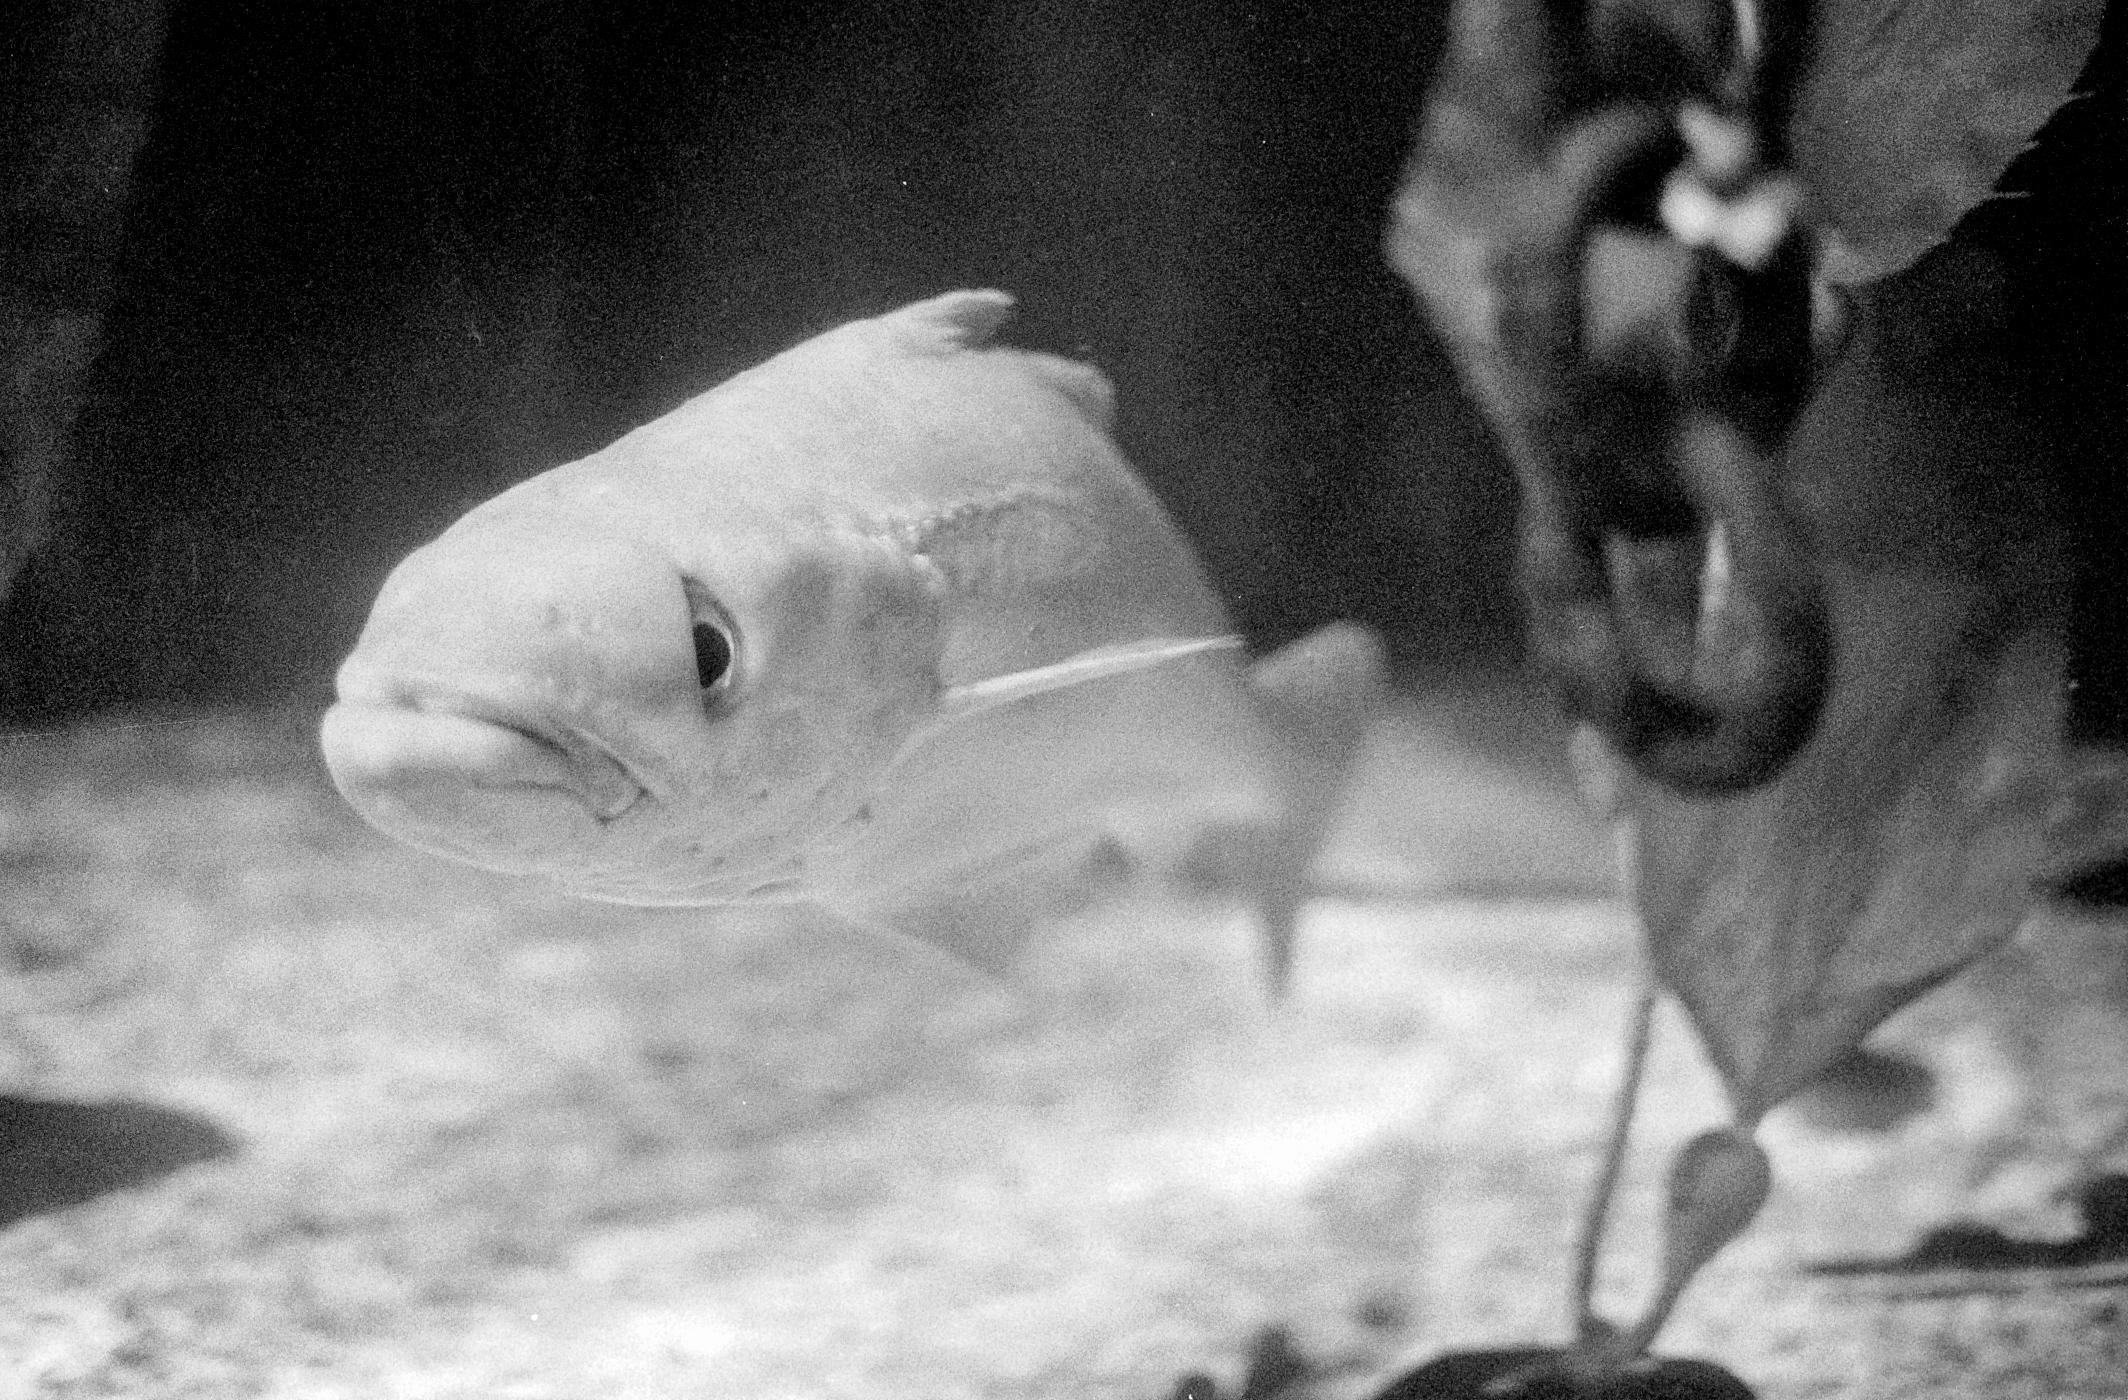 Fish near kelp (Pic: Stephen Dowling)